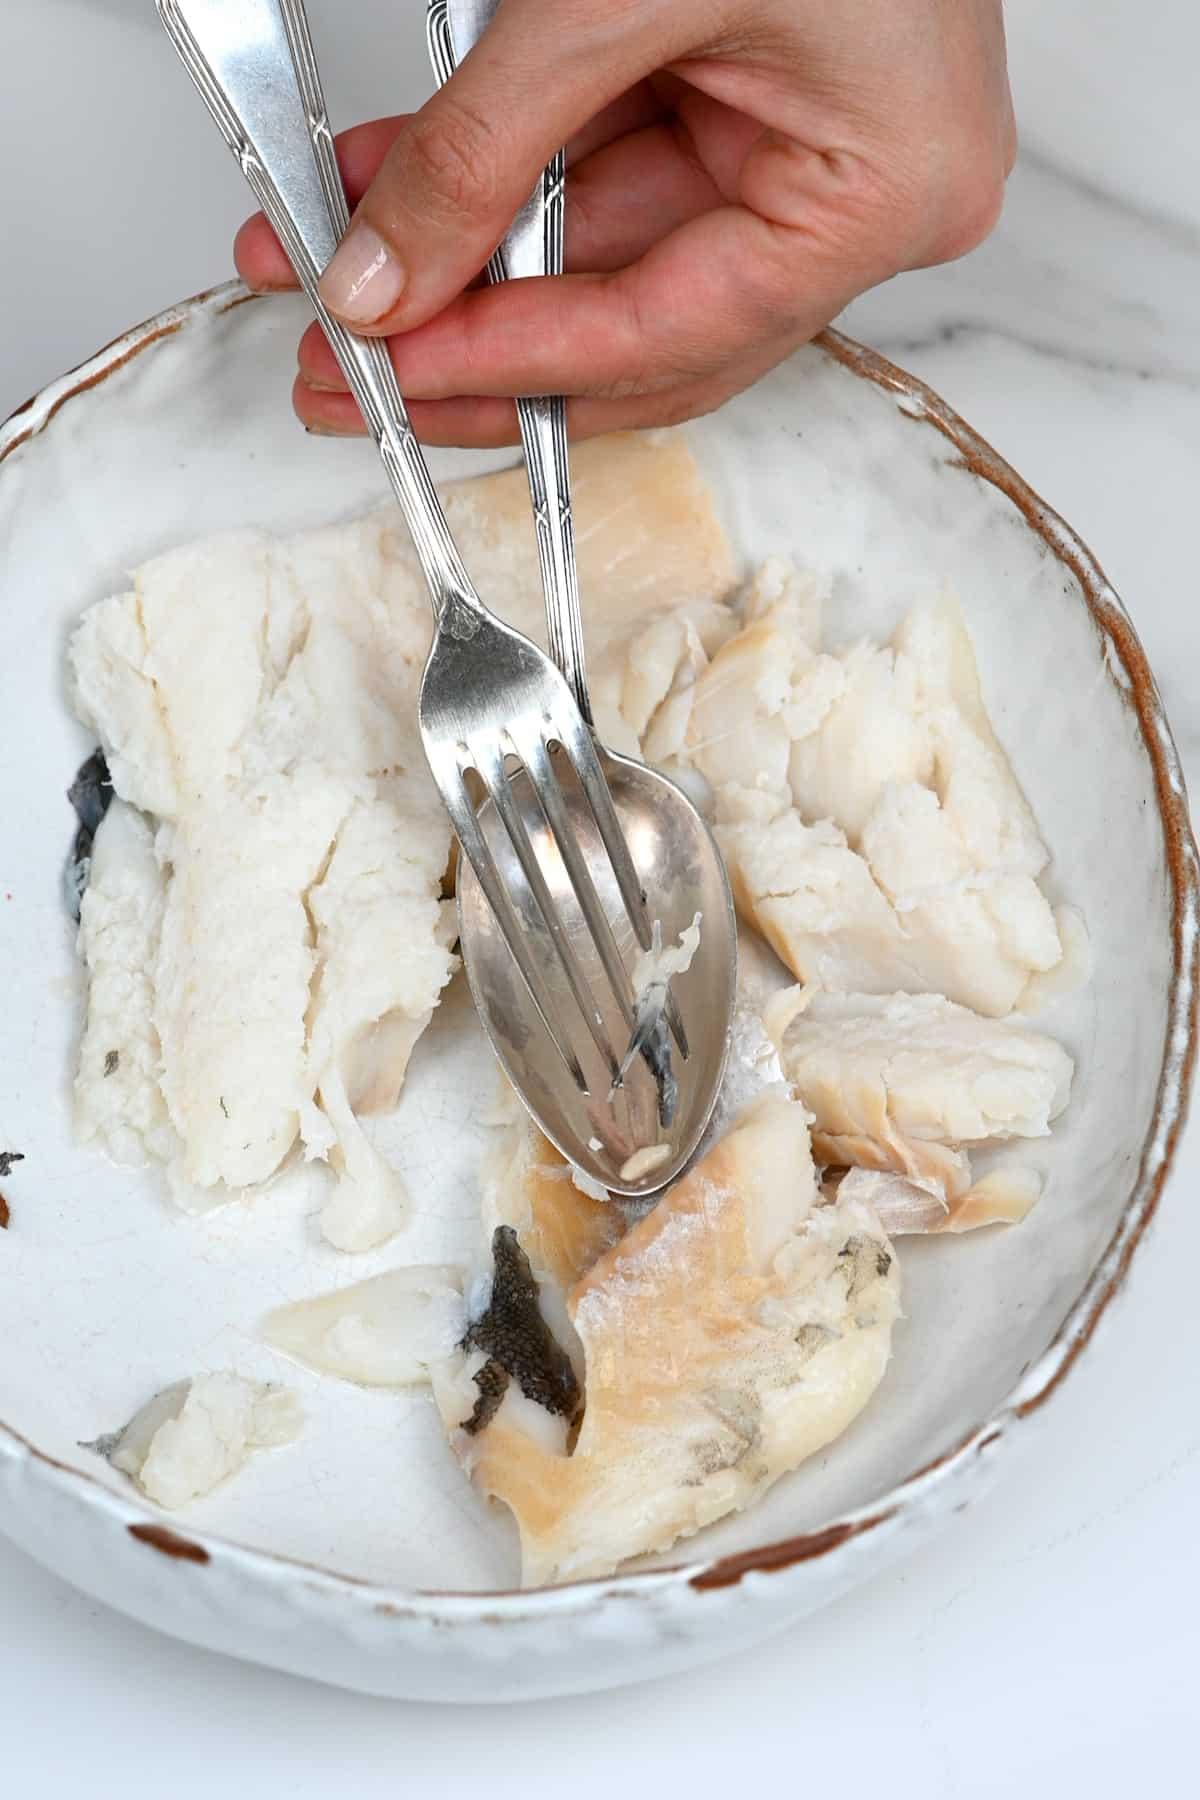 Deboning a cooked fish